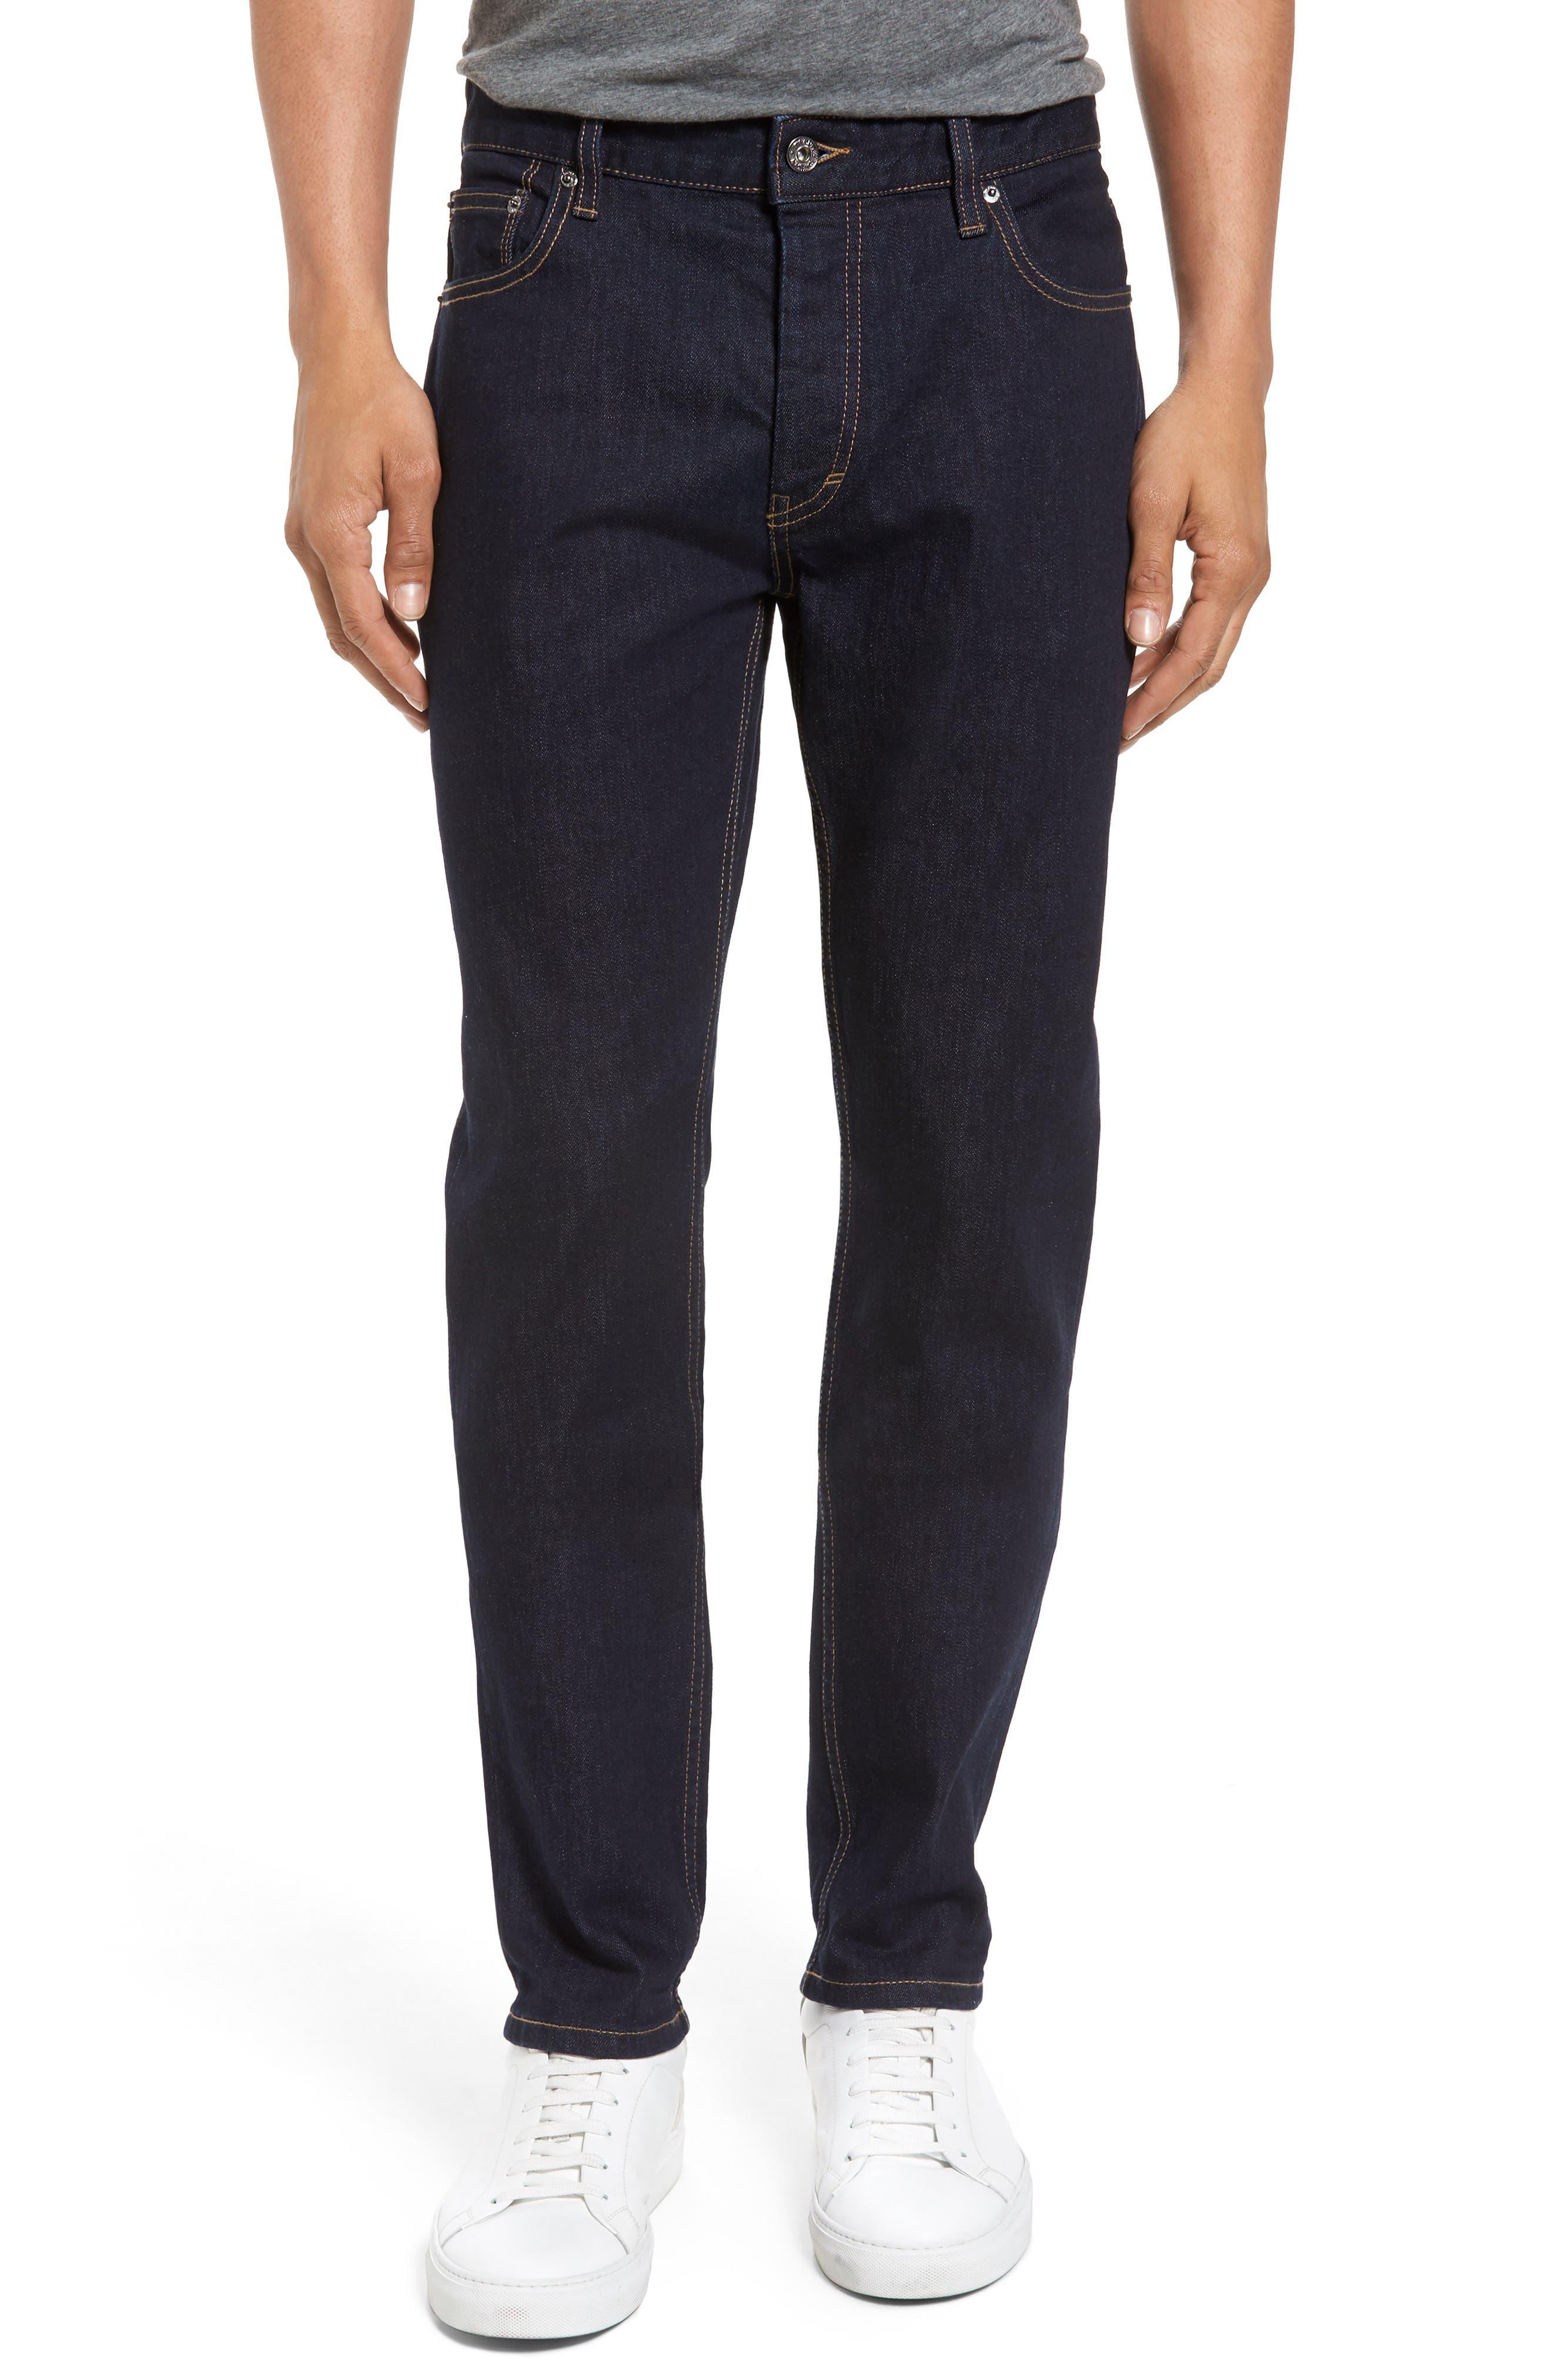 Alternate Image 1 Selected - Topman Stretch Slim Fit Raw Denim Jeans